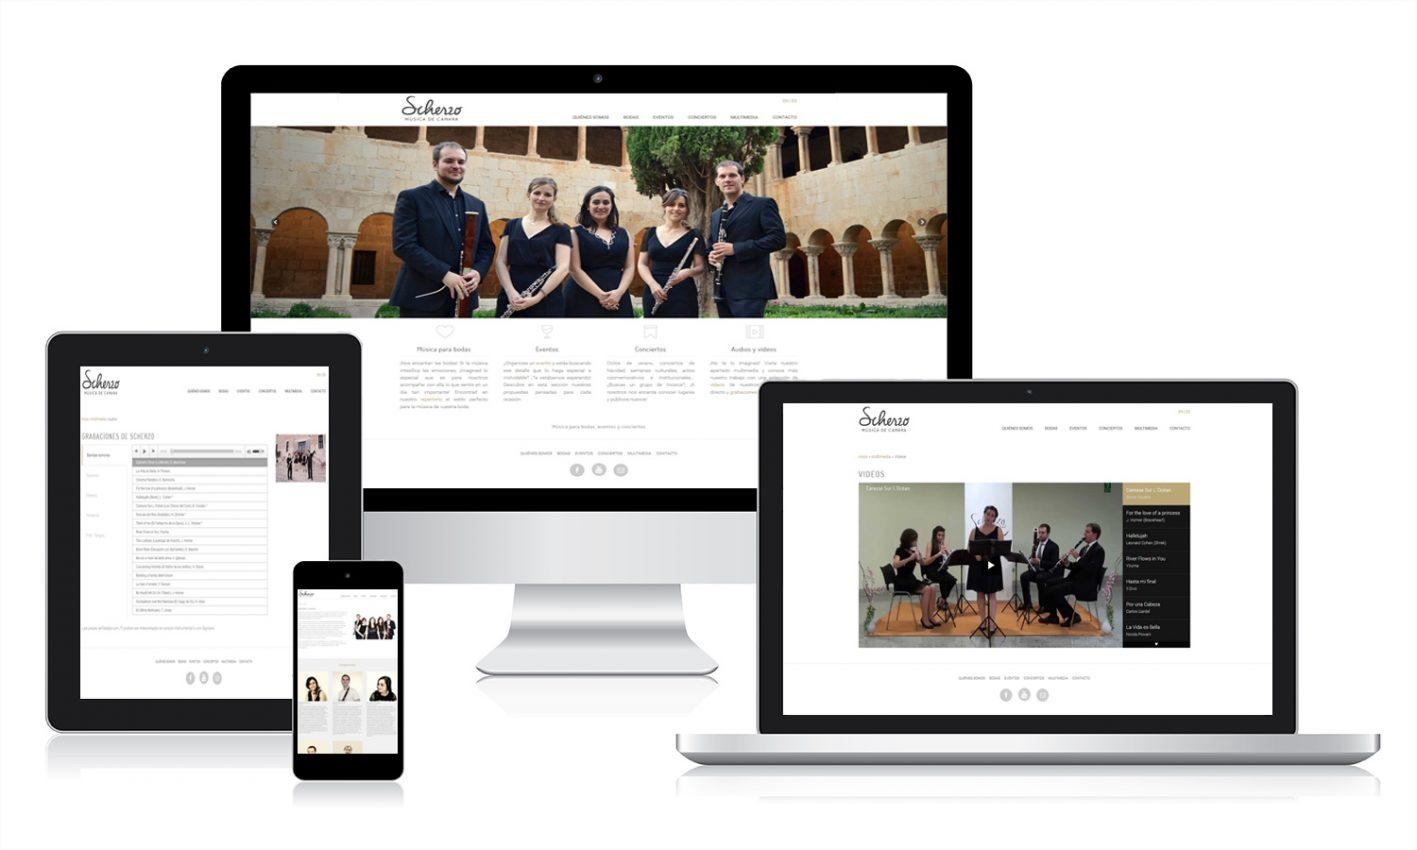 Diseño web para Scherzo